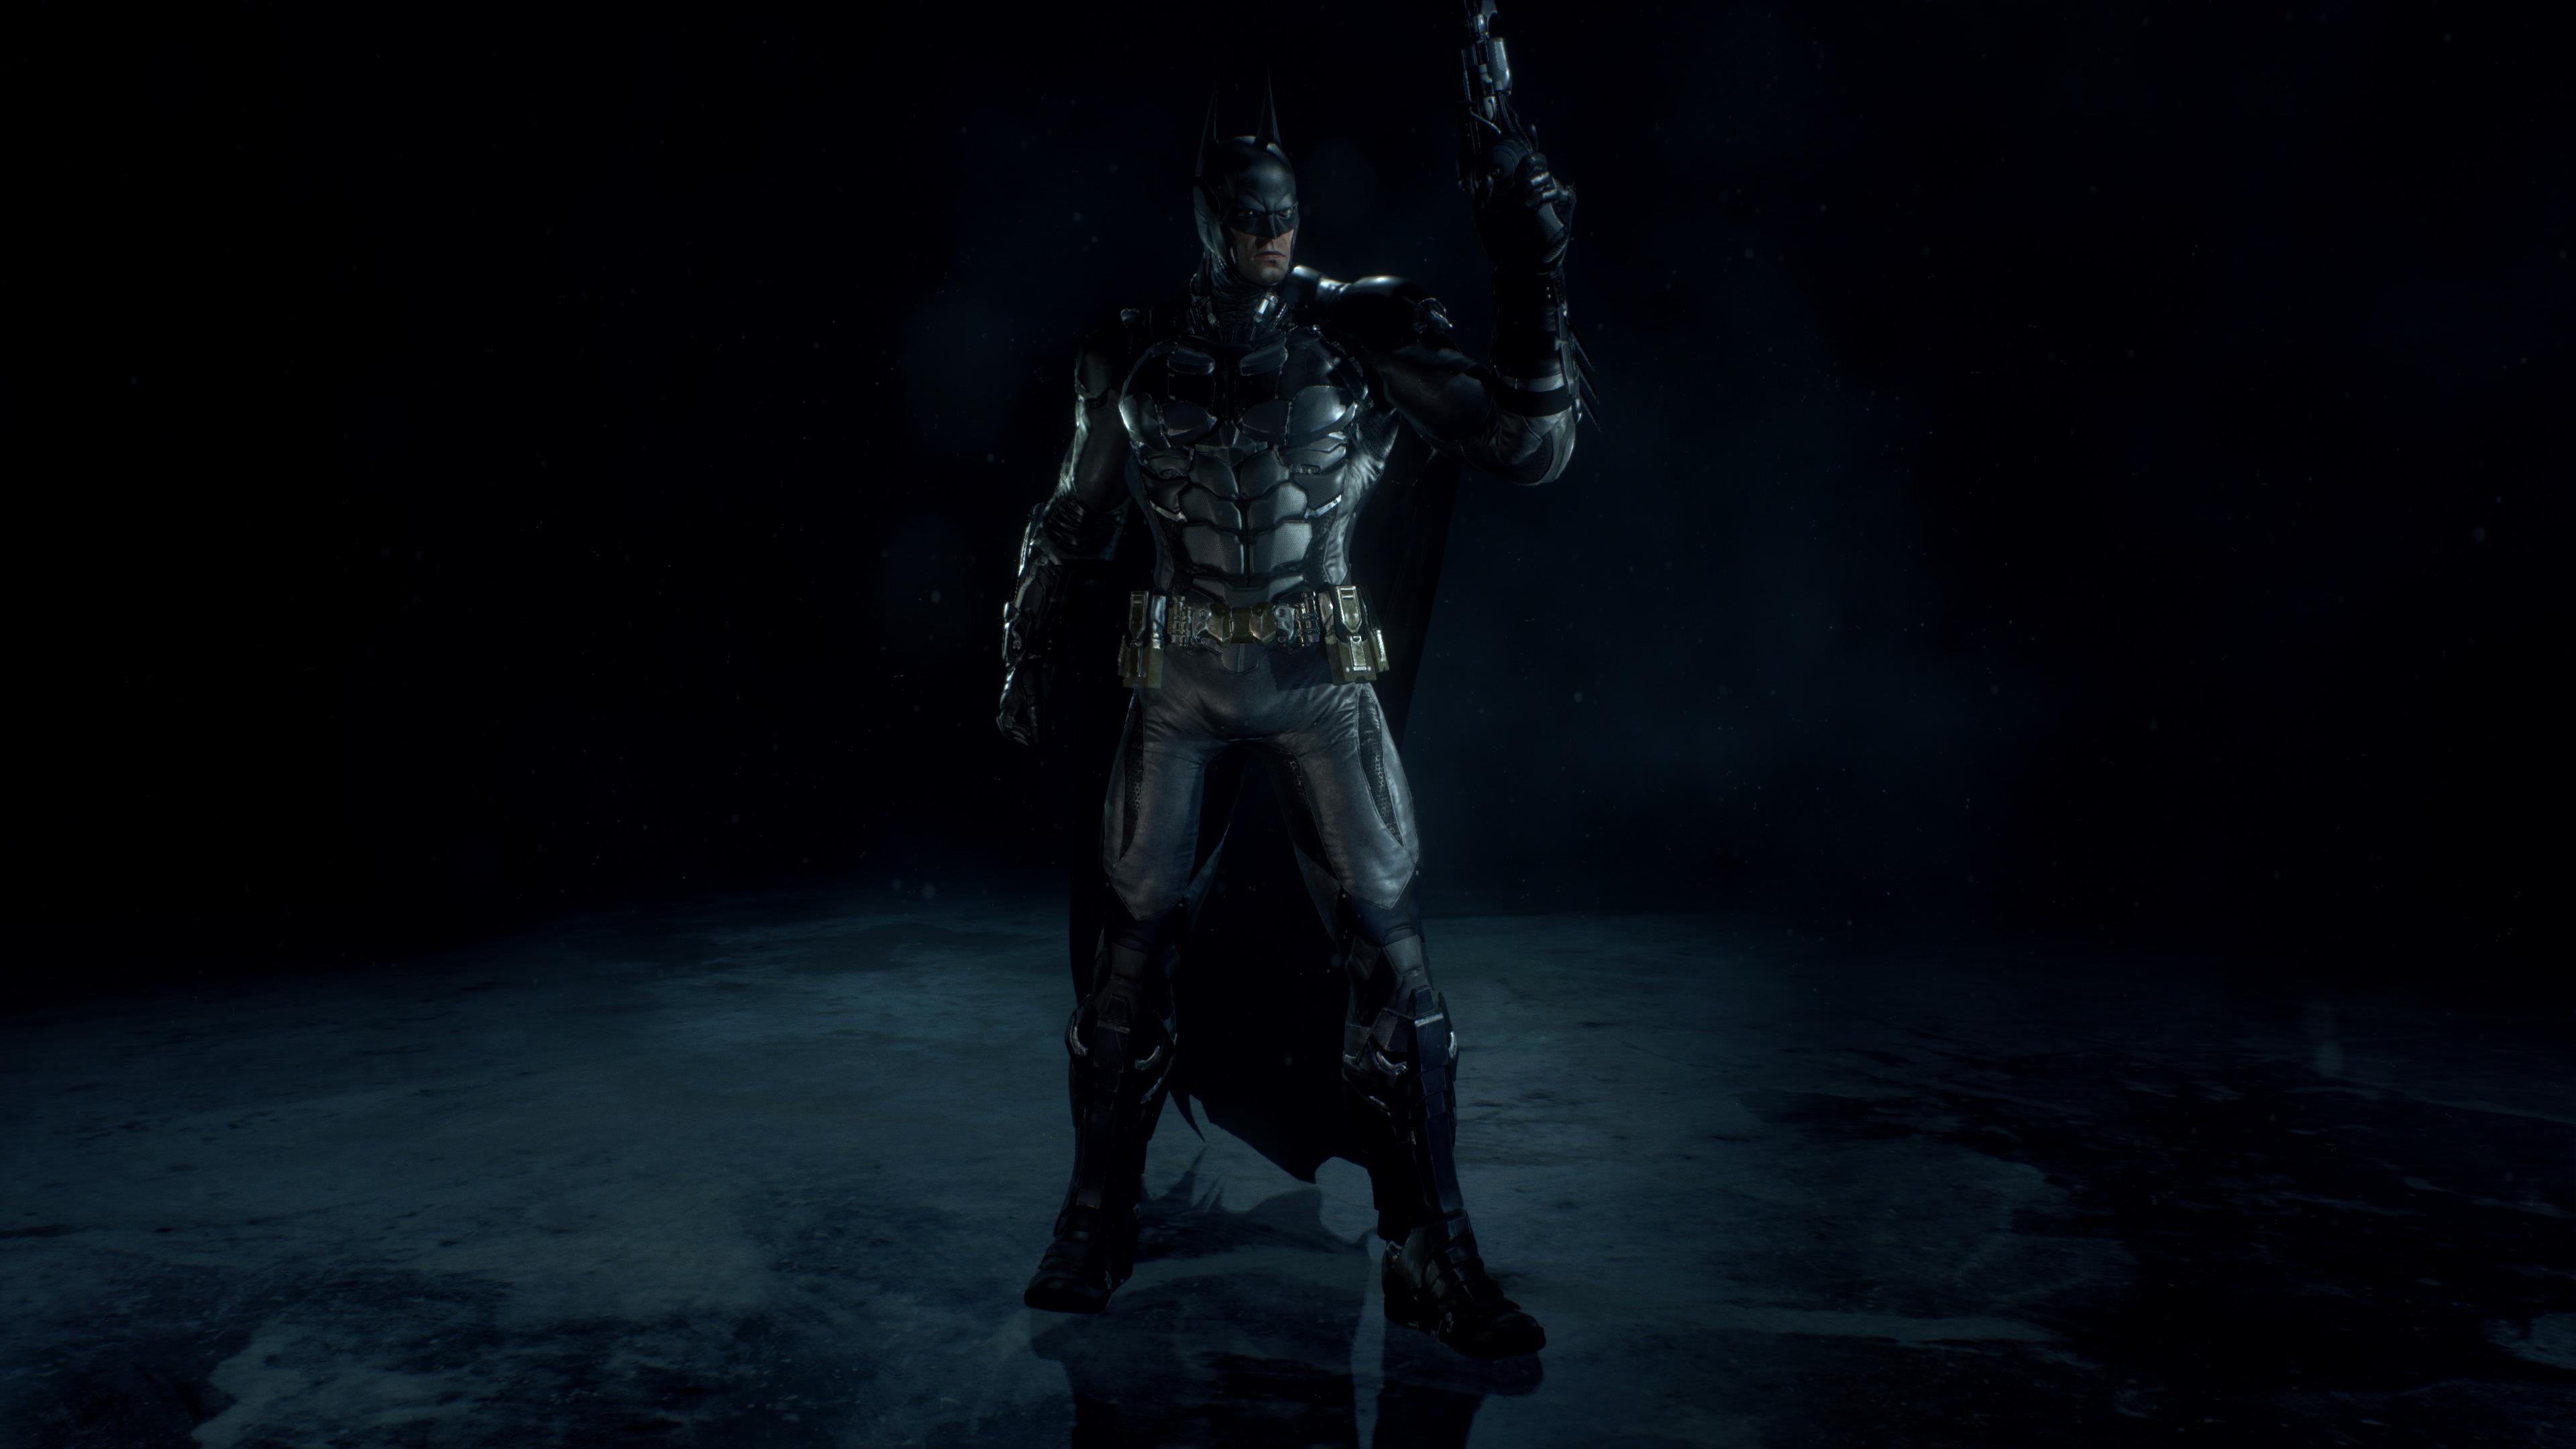 Batman Arkham Knight 2015 Video Game 4k Hd Desktop: Batman: Arkham Knight, Batman, DC Comics, Video Games